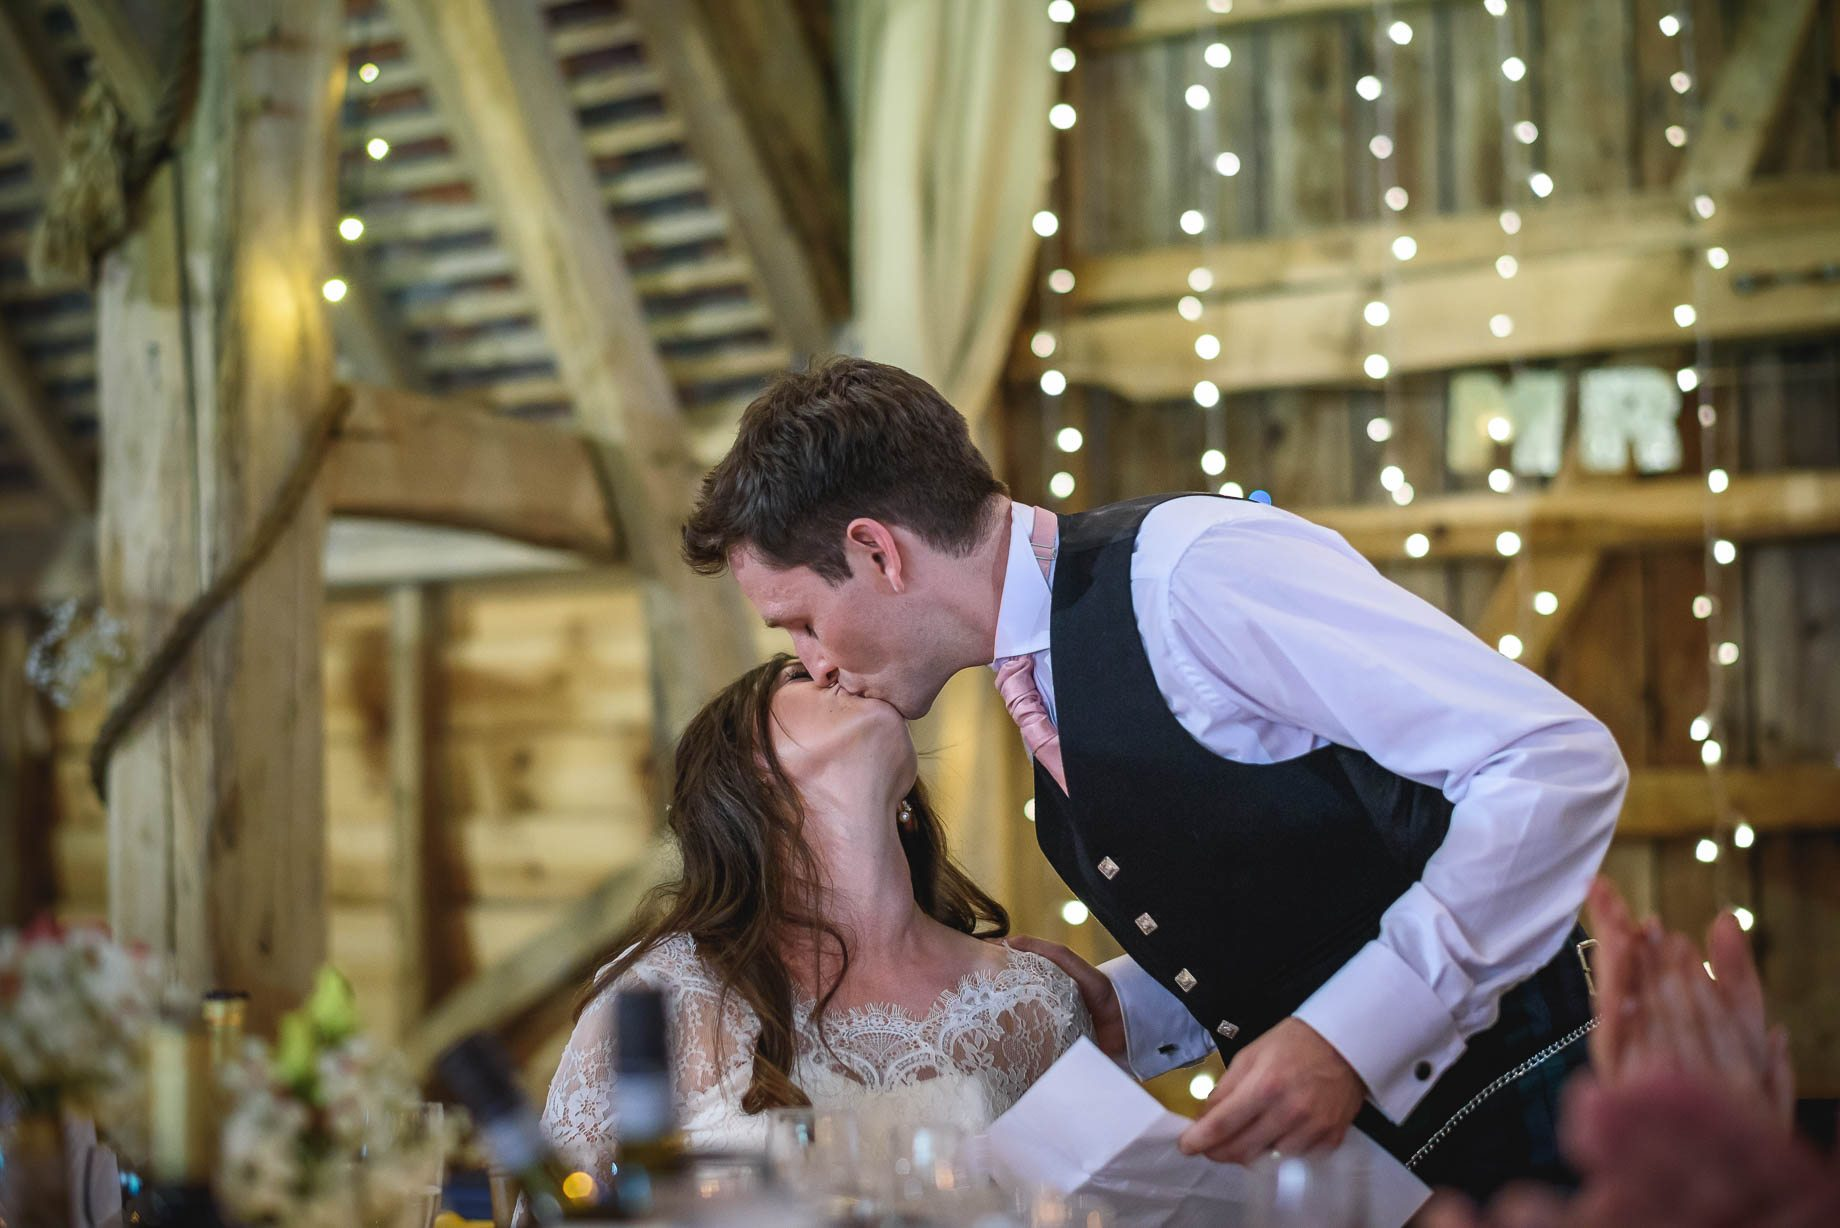 Gildings Barn wedding photography - Sarah and Steve (142 of 190)